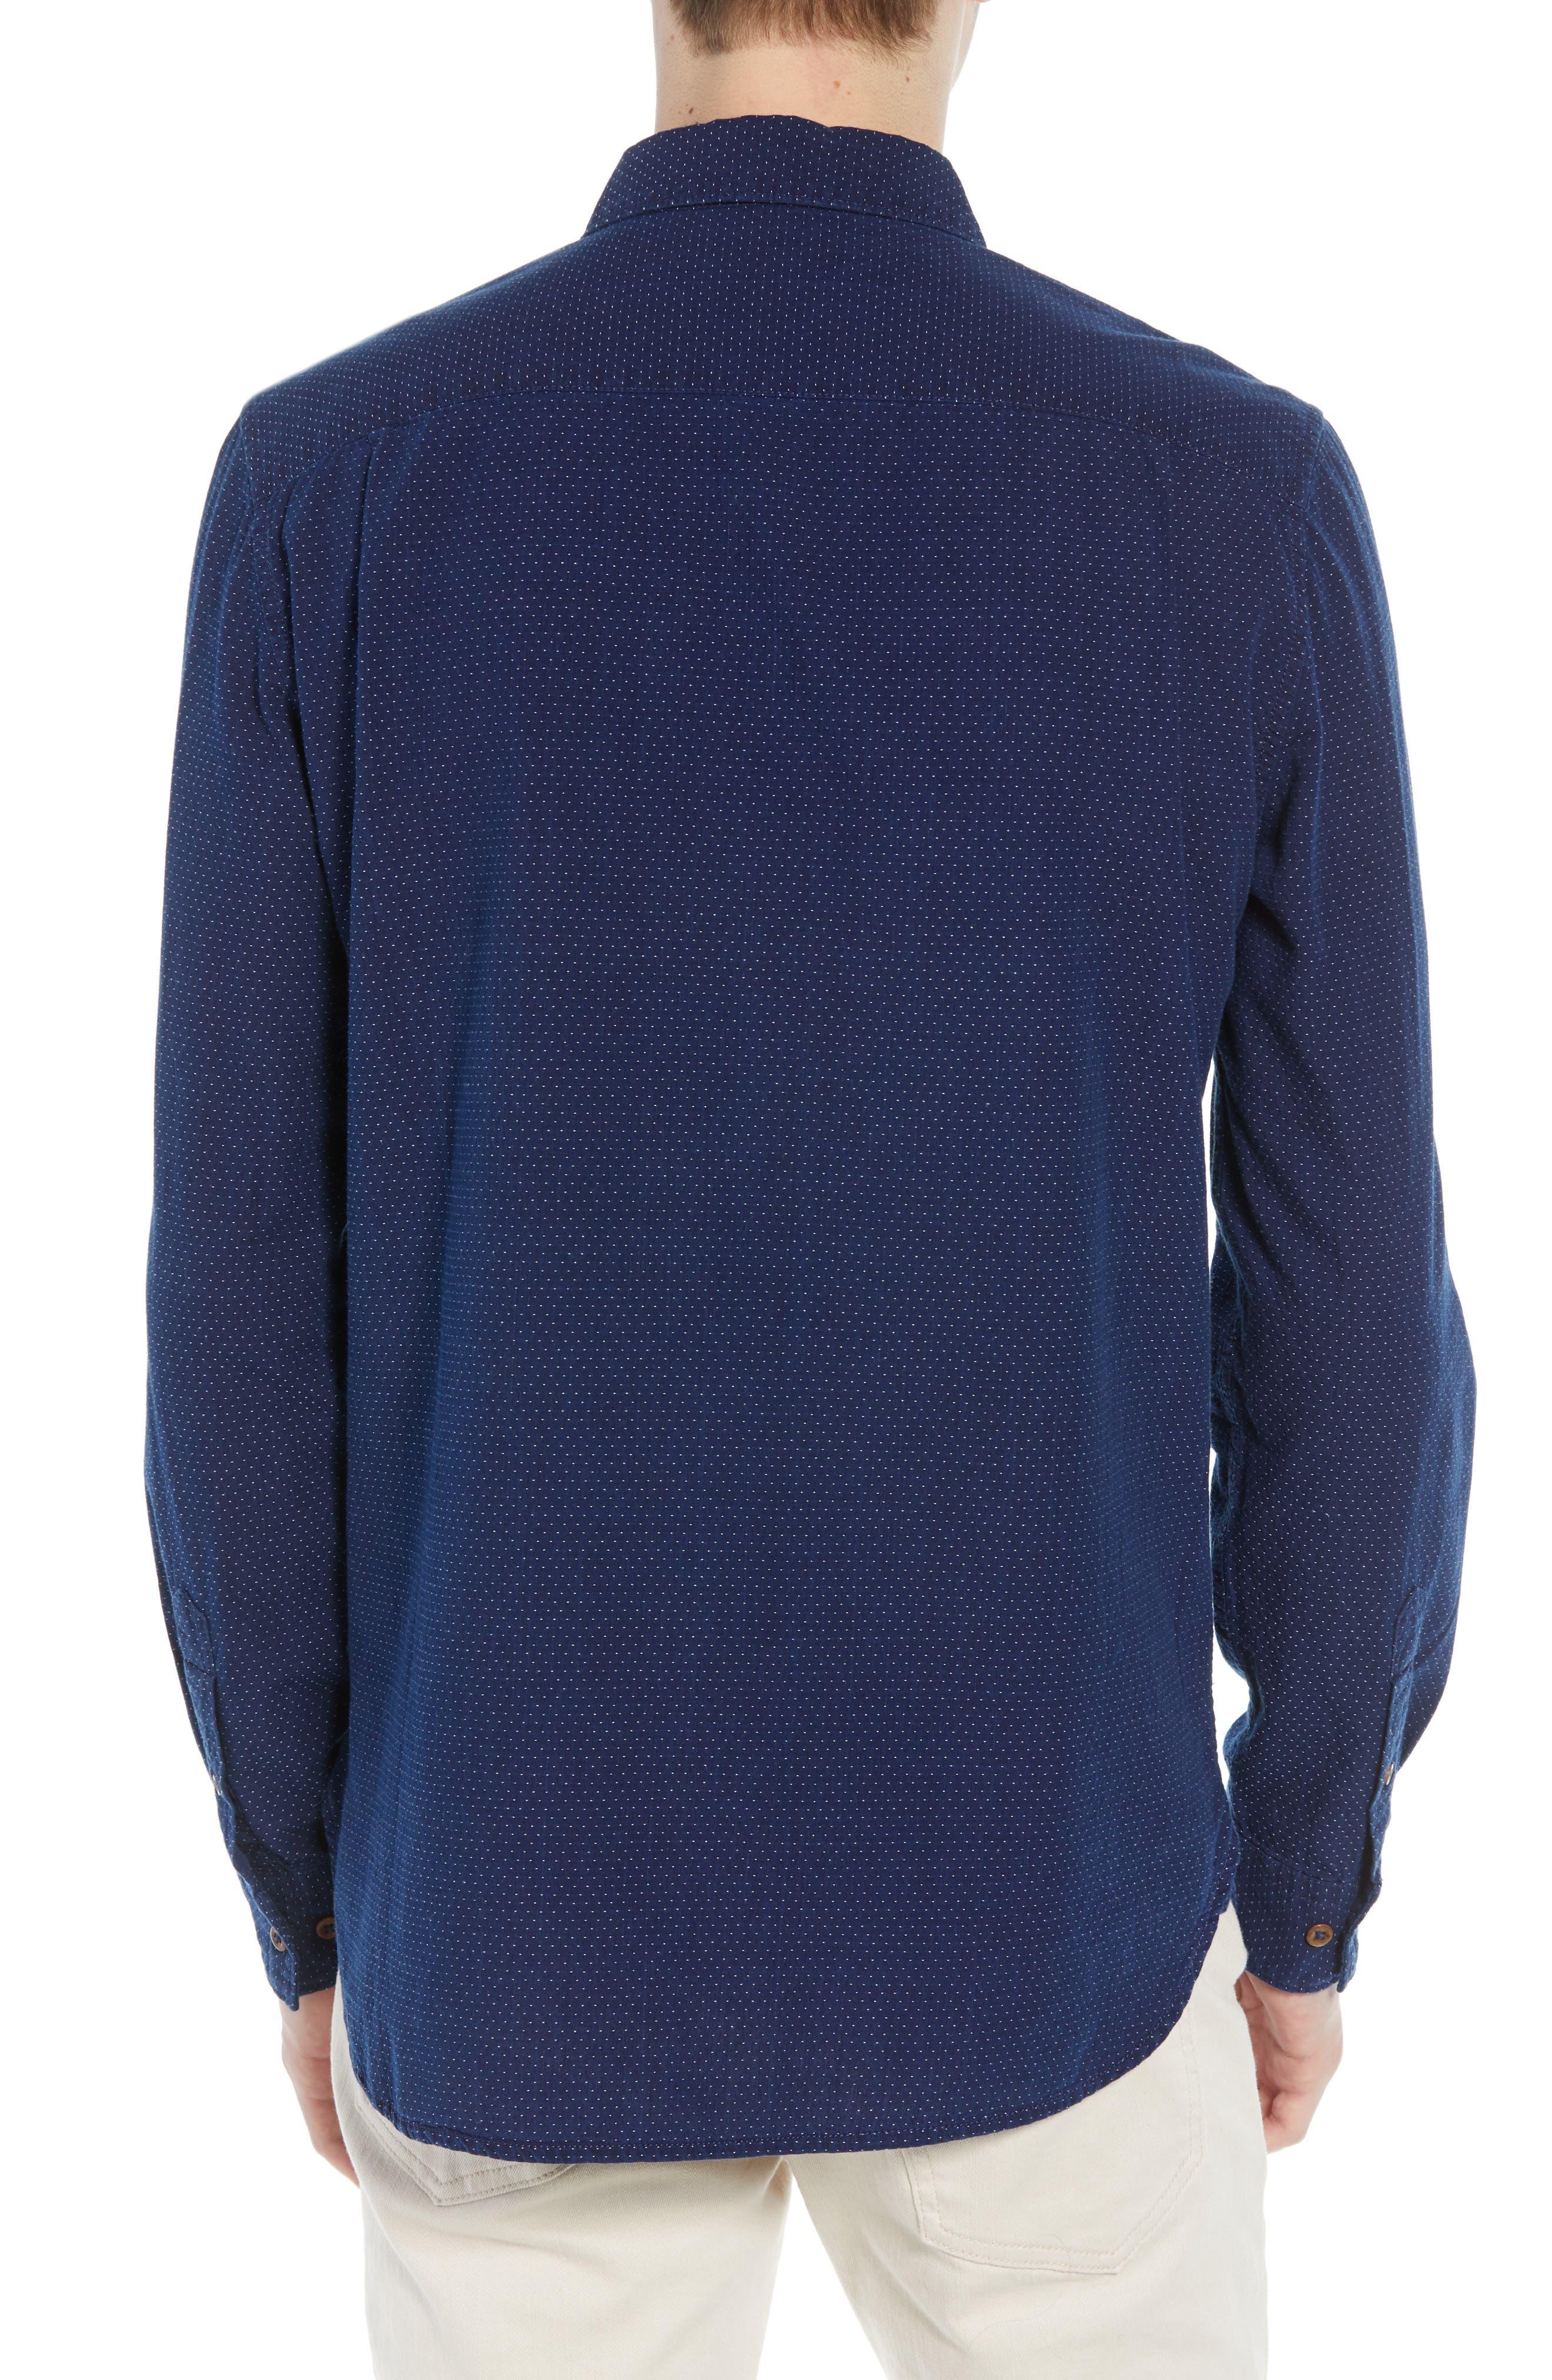 Indigo Dot Regular Fit Sport Shirt,                             Alternate thumbnail 3, color,                             VINTAGE